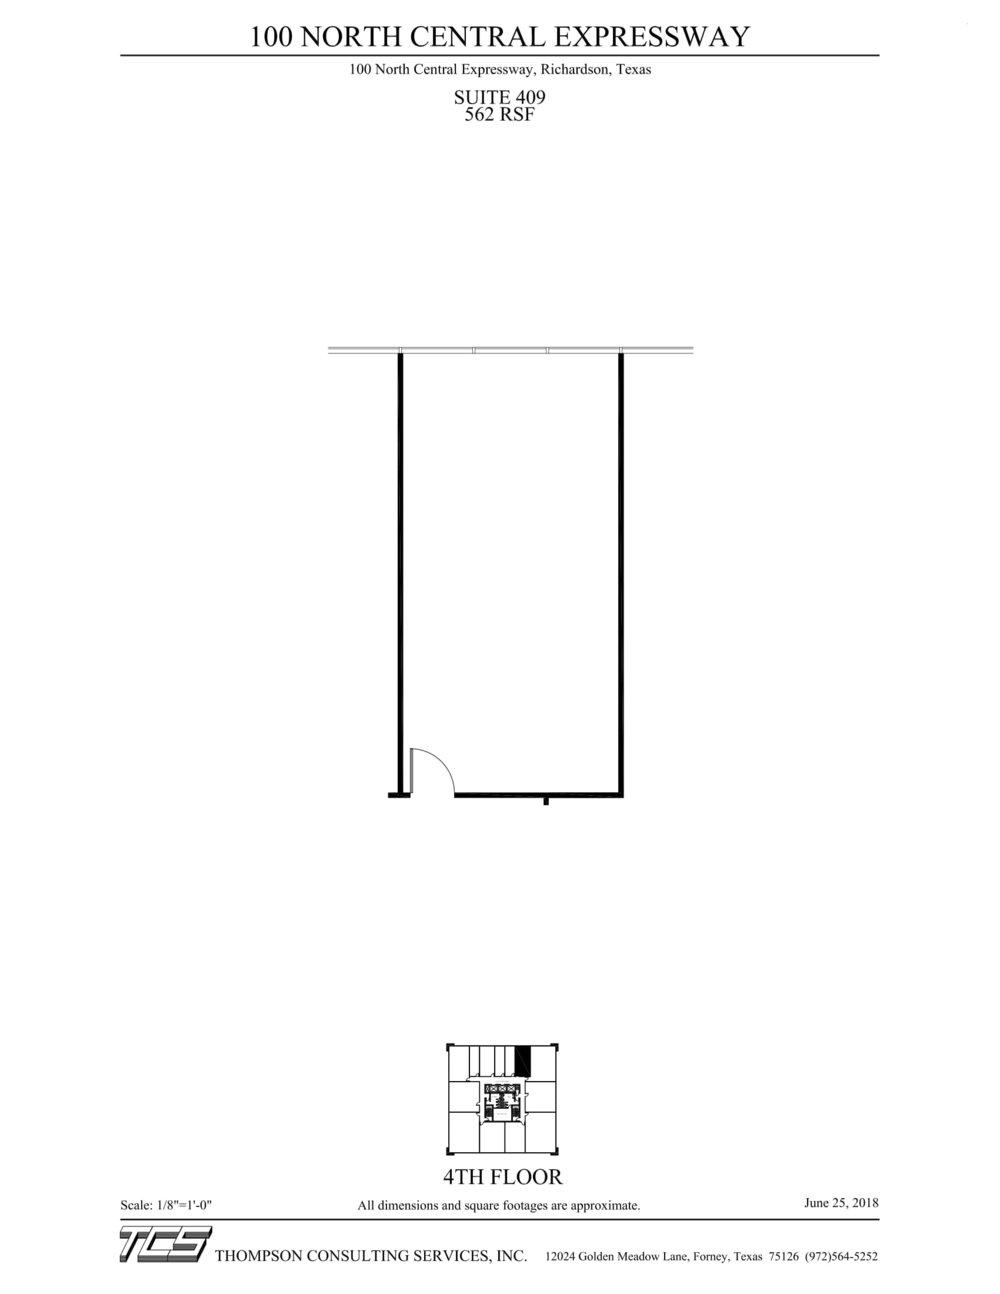 100 N Central Expressway - Suite 409 - Marketing plan-1